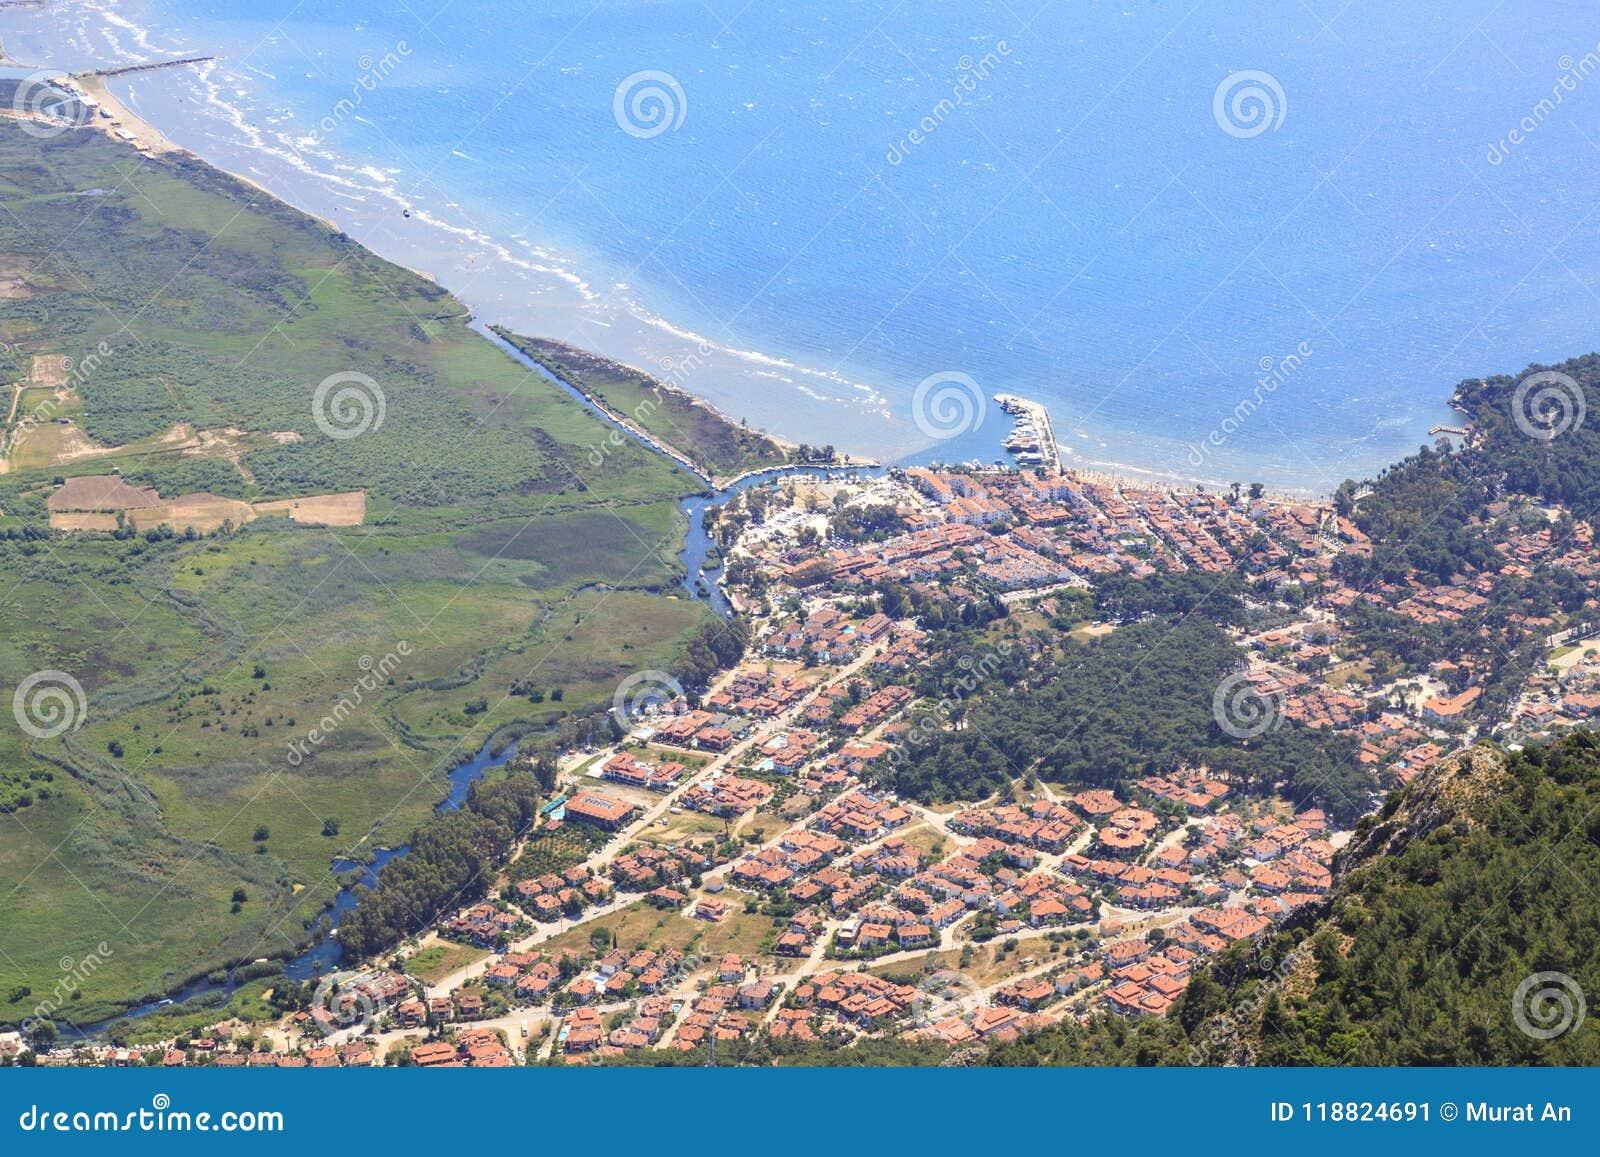 Akyaka cityscape from sakartepe with aegean sea